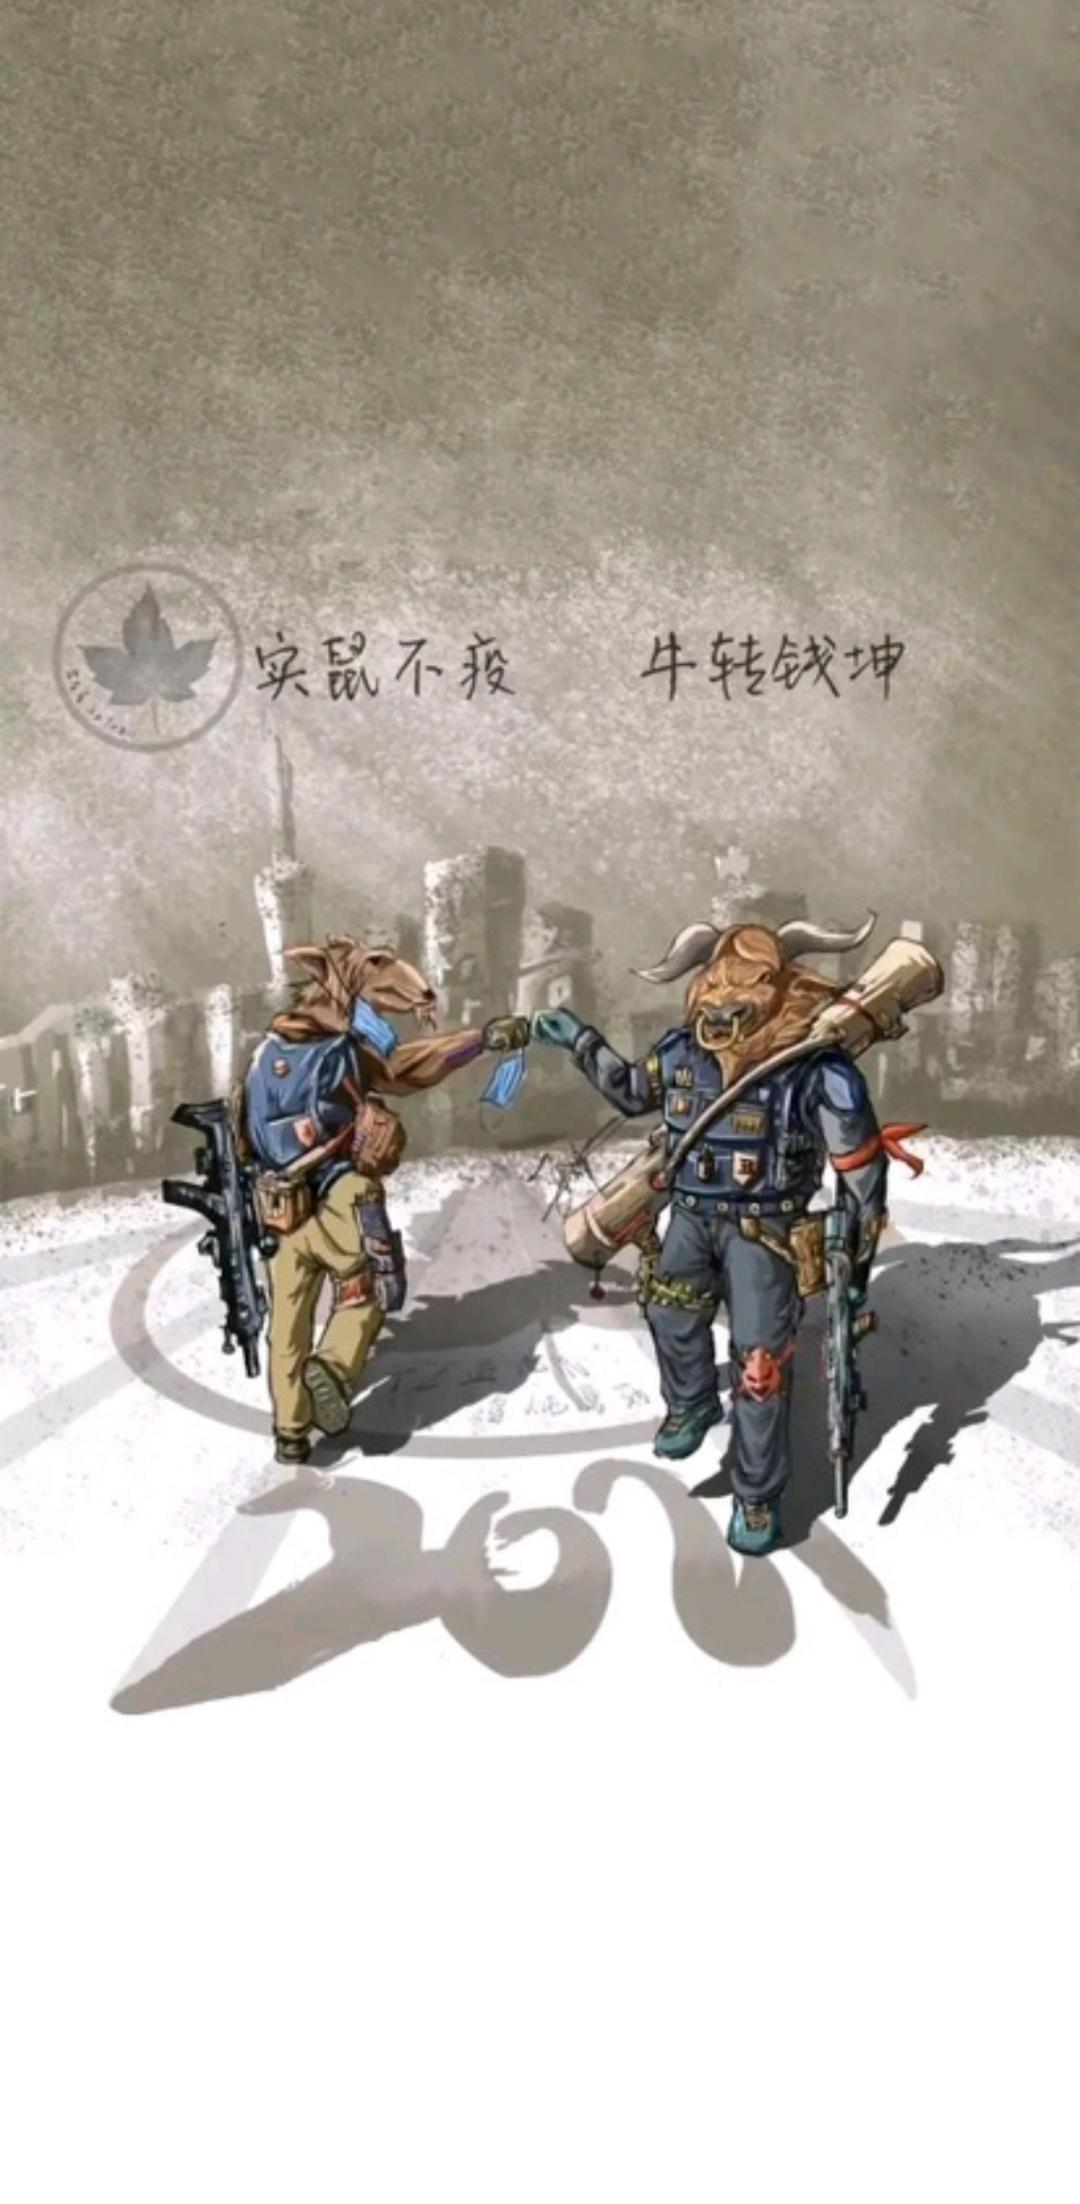 Screenshot_20210101_113452_com.xindongshisan.thireteenfriend.jpg